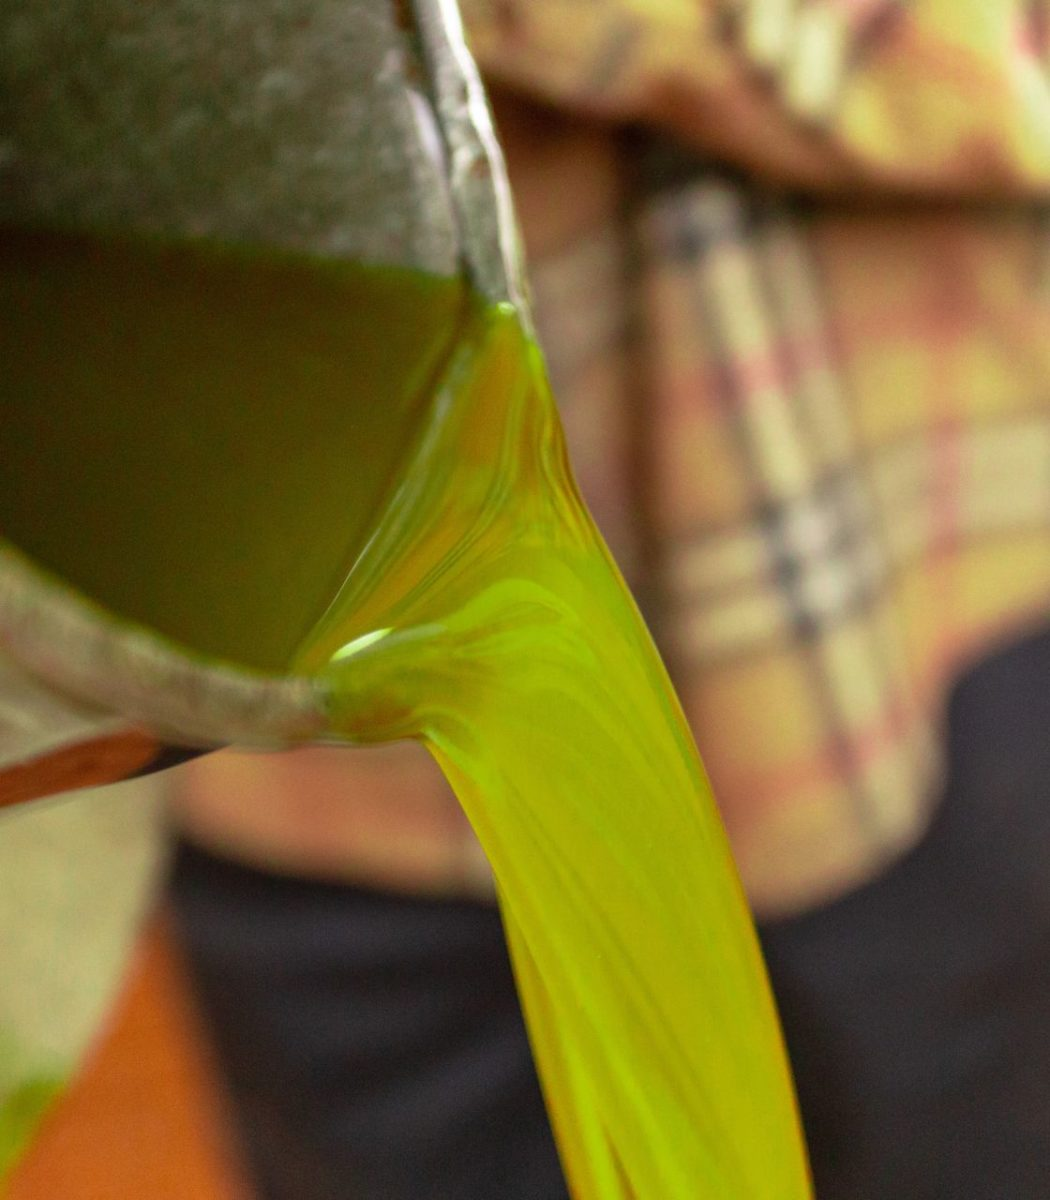 manfanetti-olio-extra-vergine-toscano-biologico-62